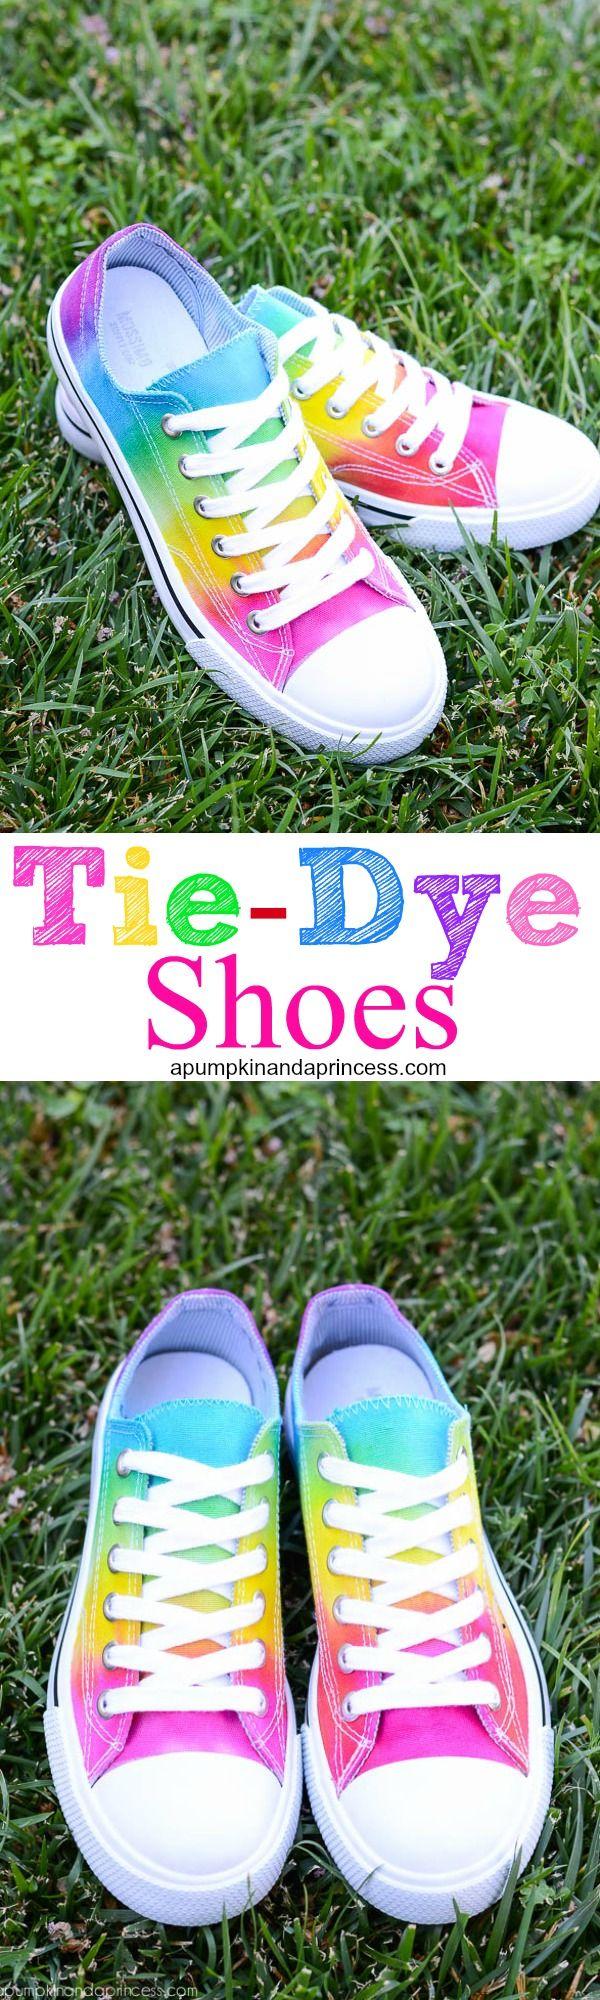 Rainbow Tie-Dye Shoes - A Pumpkin And A Princess